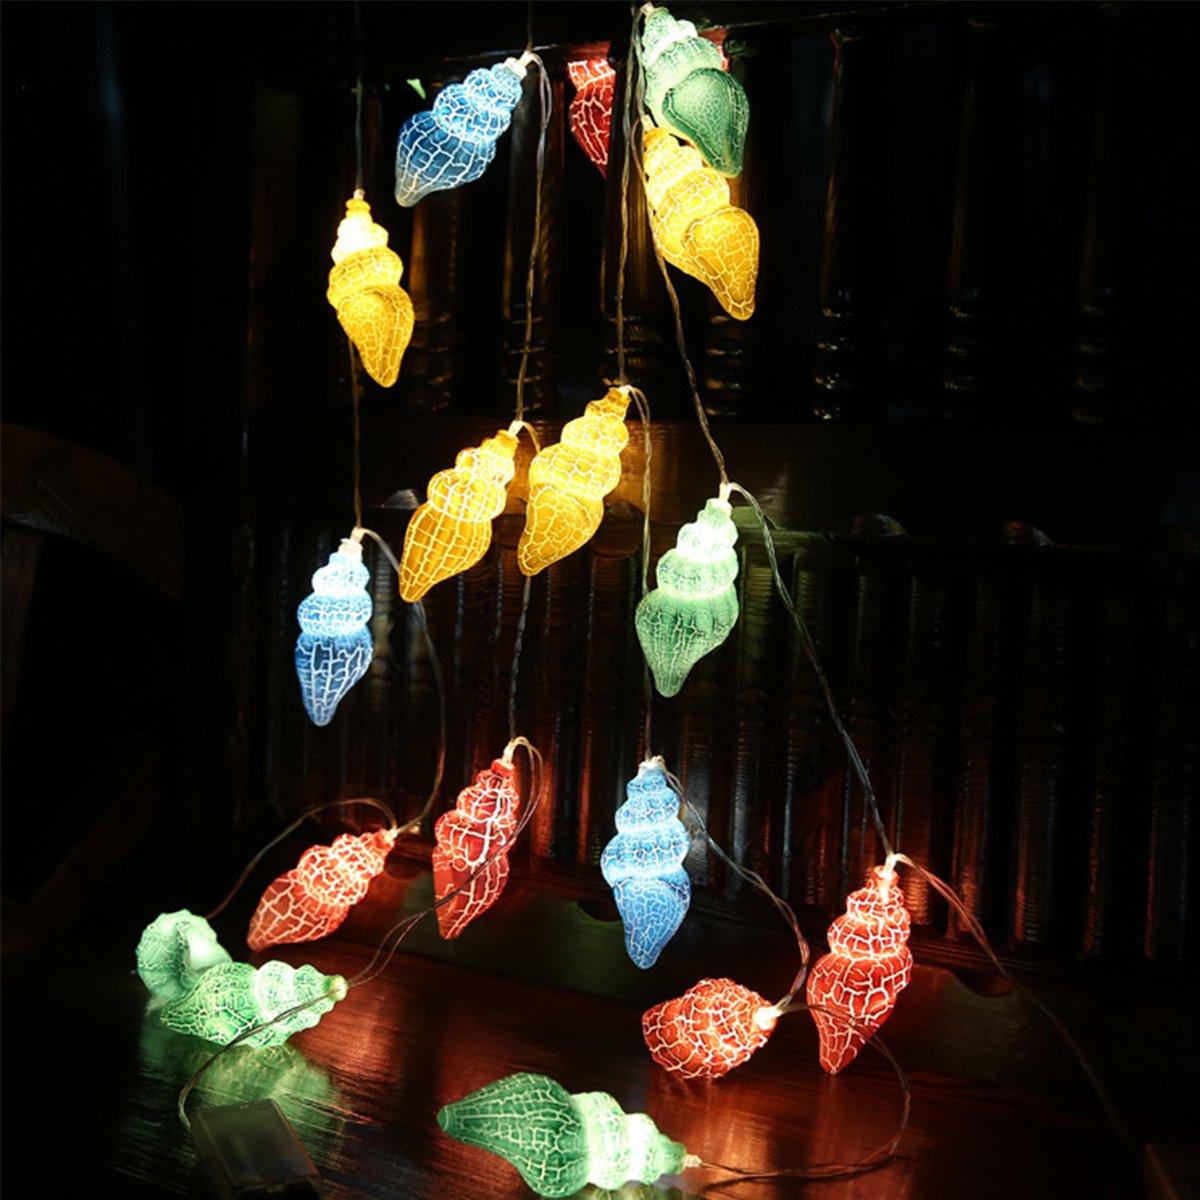 Queenland 5 ft 10 LED fantasticグローバル文字列ライト電池式フェアリーライトパーティークリスマスツリーハンギングオーナメントウェディングガーデンアウトドアインドア装飾 1.5 meters レッド B07DK55CJT 14819  Conch